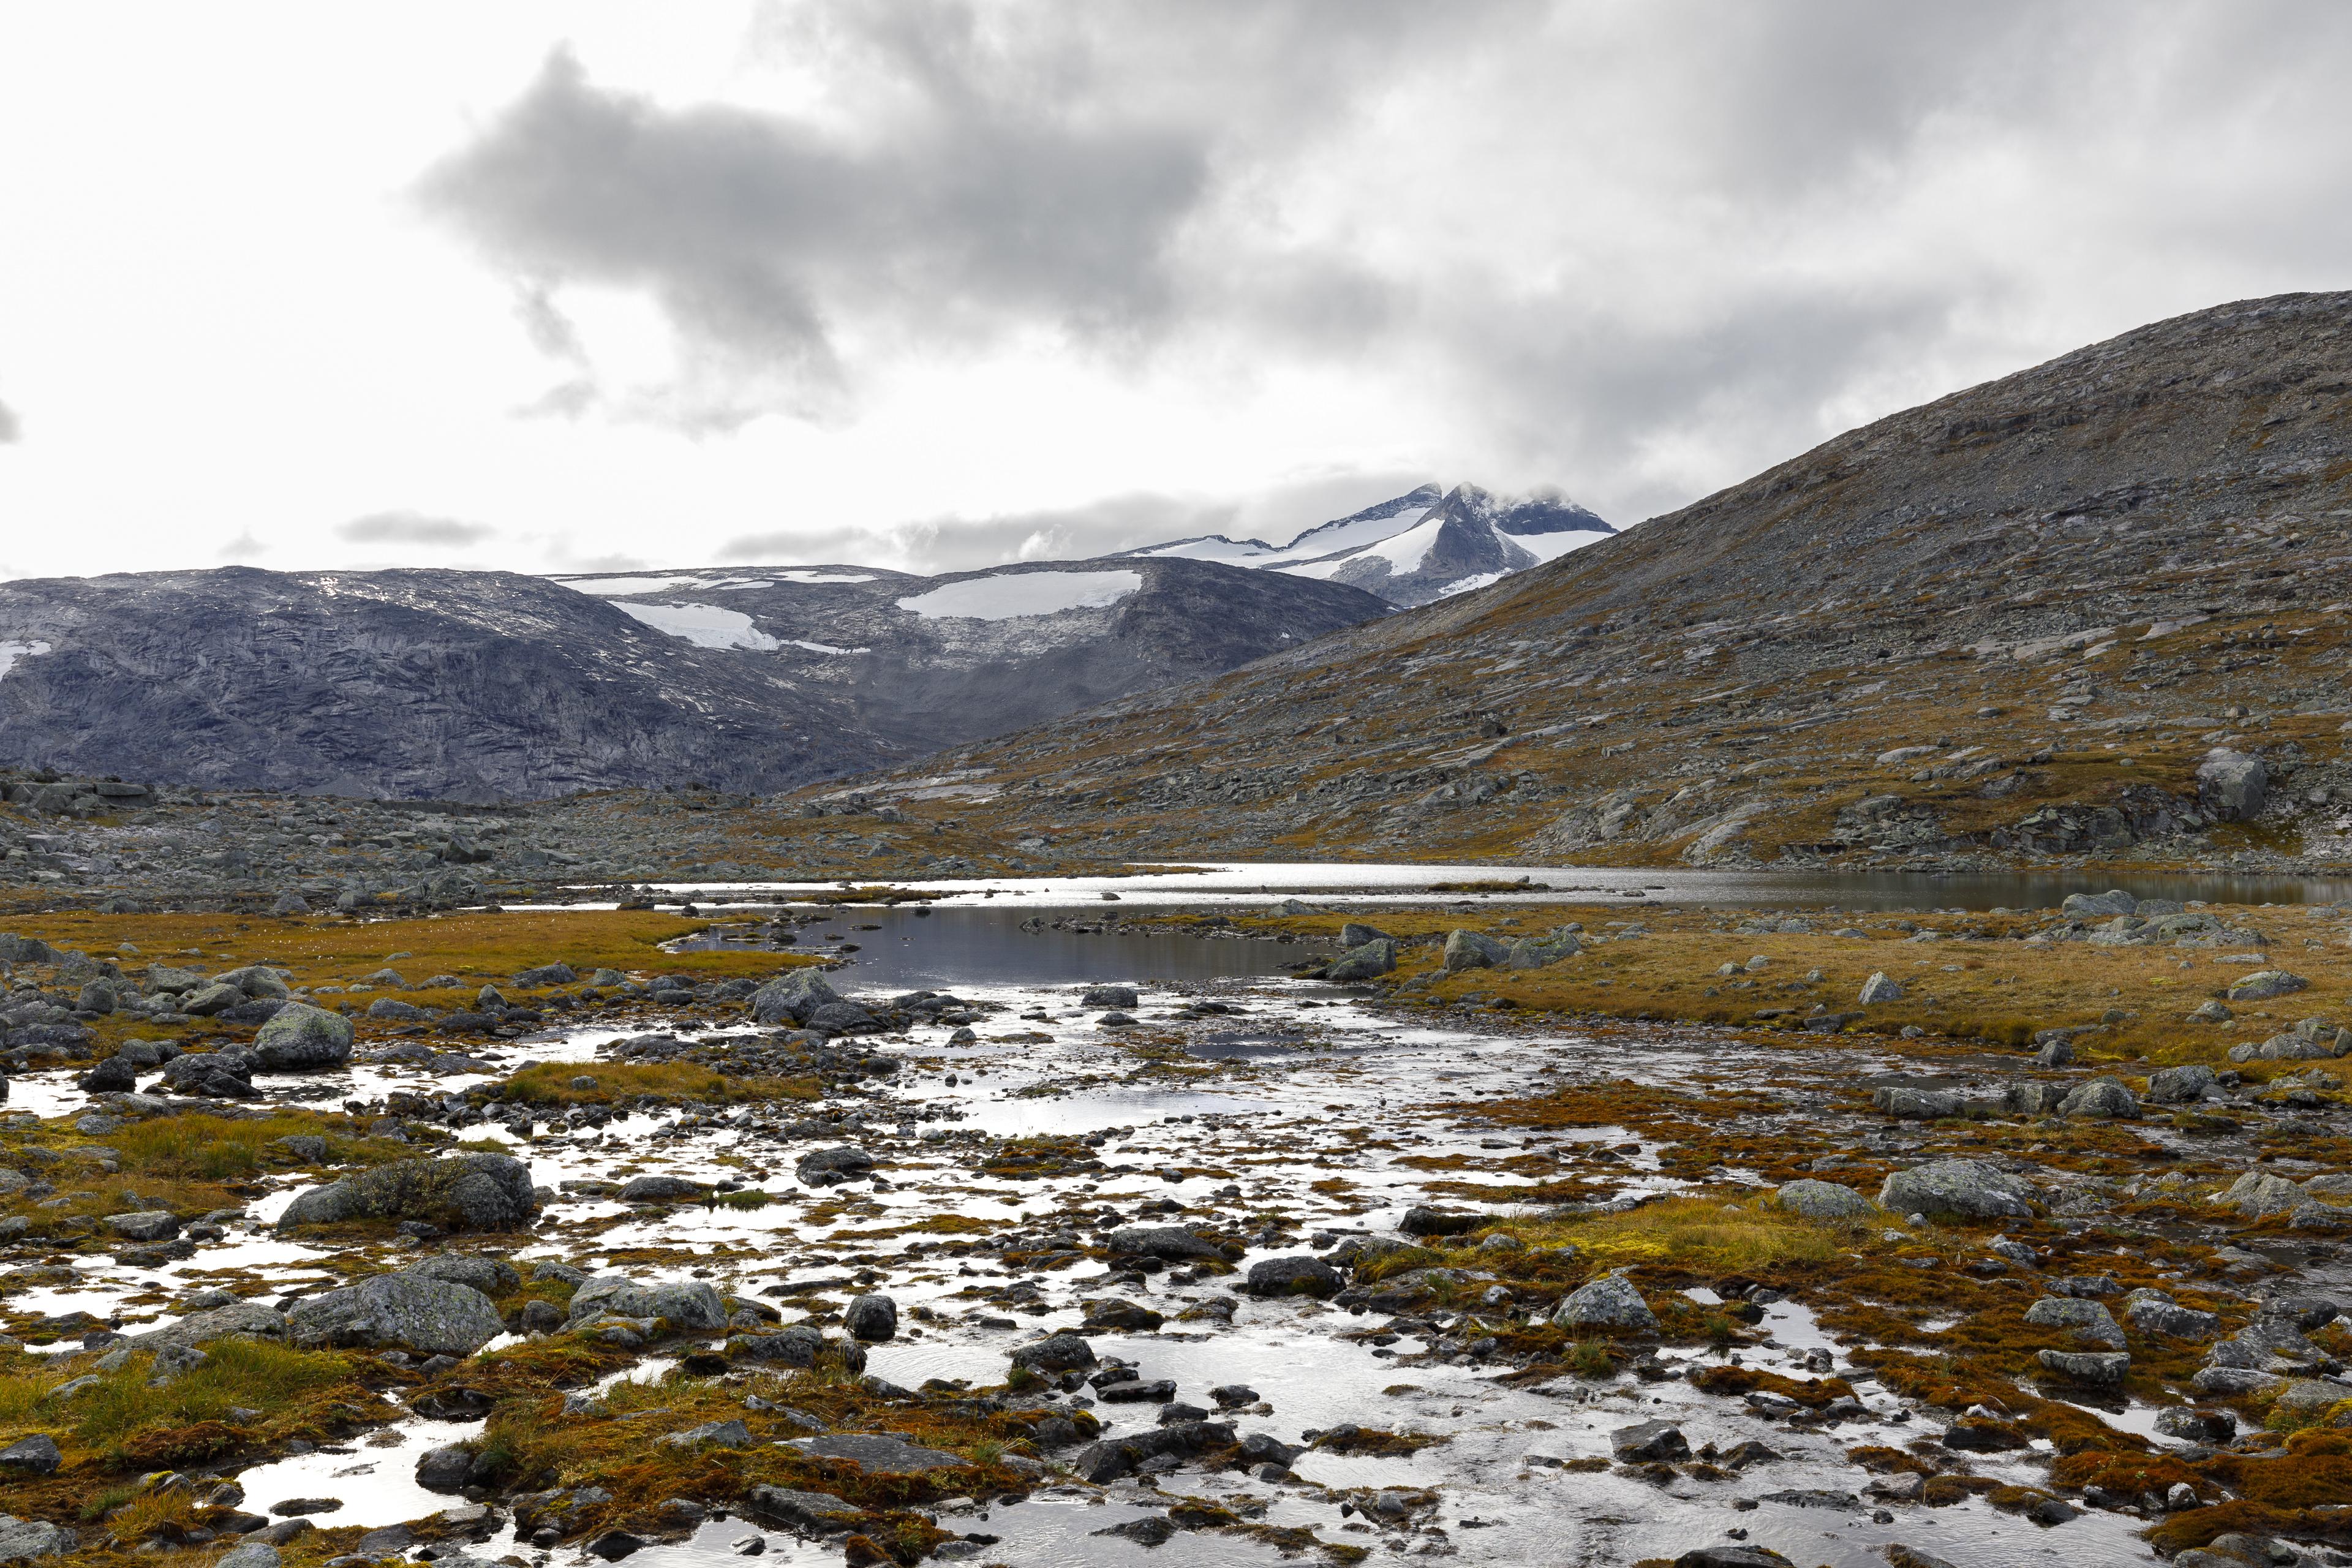 Blick aus dem Oallavággi zurück auf das Storsteinsfjellet mit dem Sealggajiekna,©Markus Proske—Canon EOS 5D Mark IV, EF16-35mm f/4L IS USM, 35mm, 1/60s, Blende 11, ISO 125